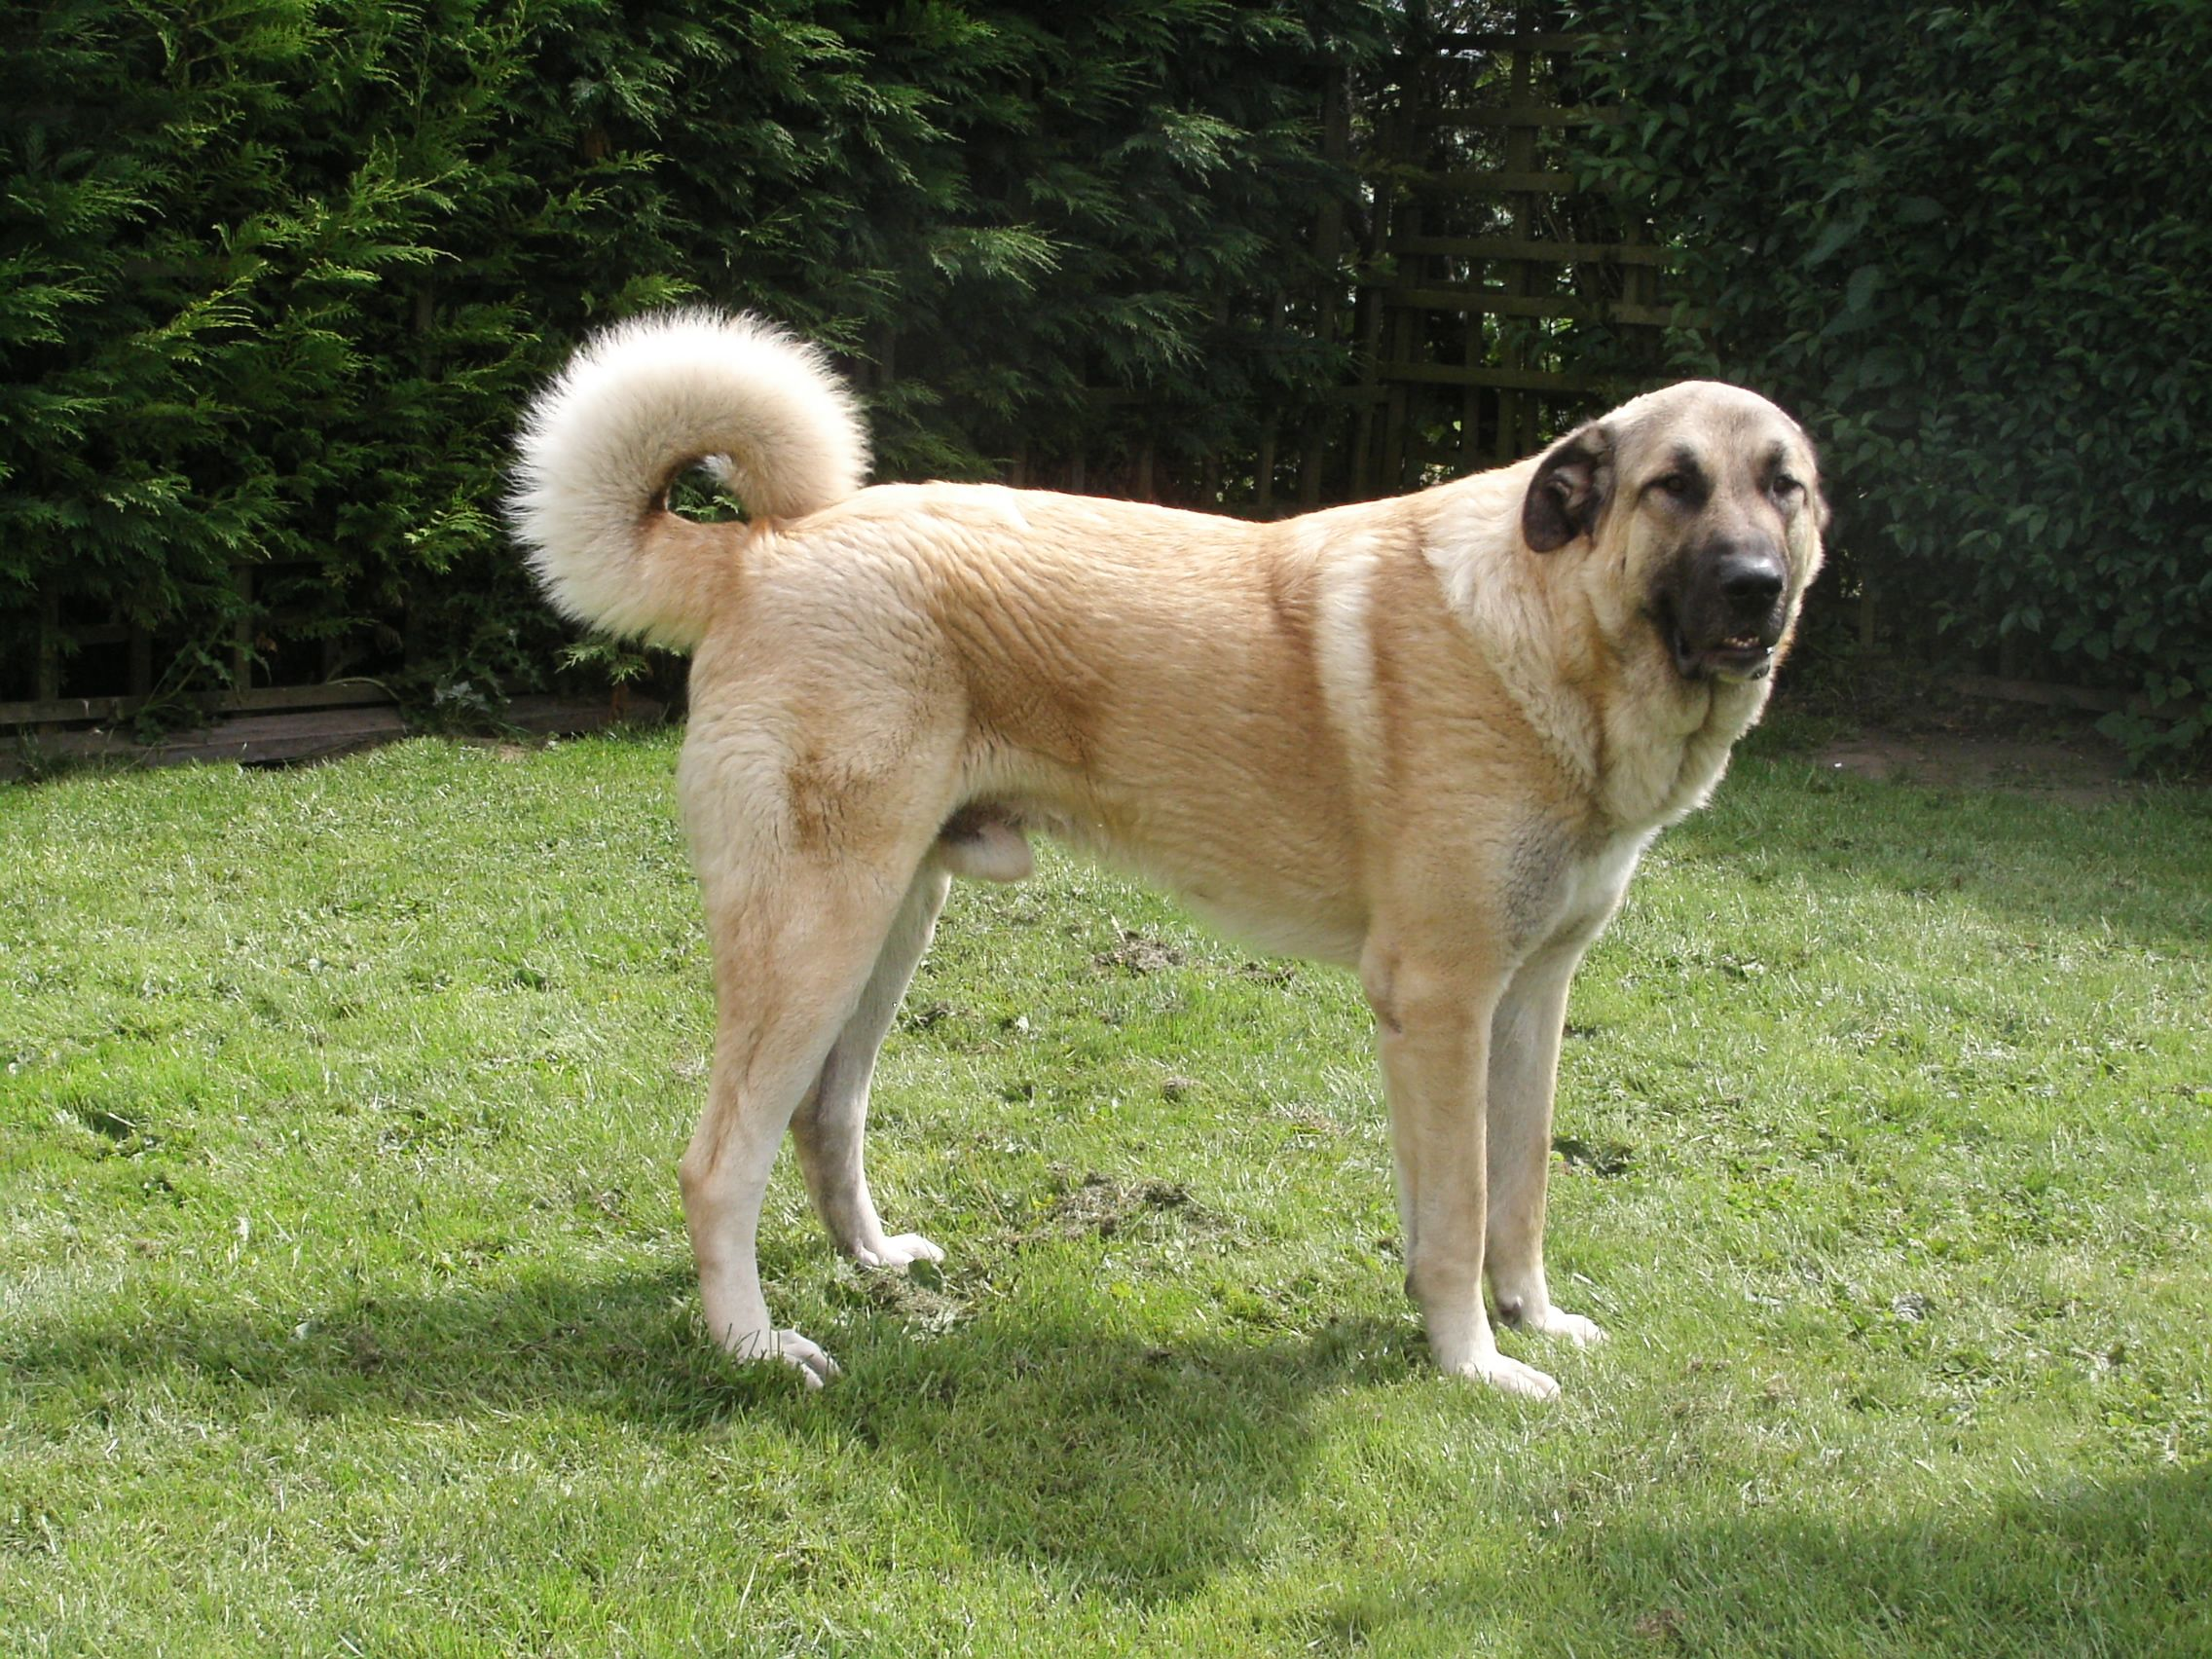 Anatolianshepherd The Large Dog Breed Anatolian Shepherd